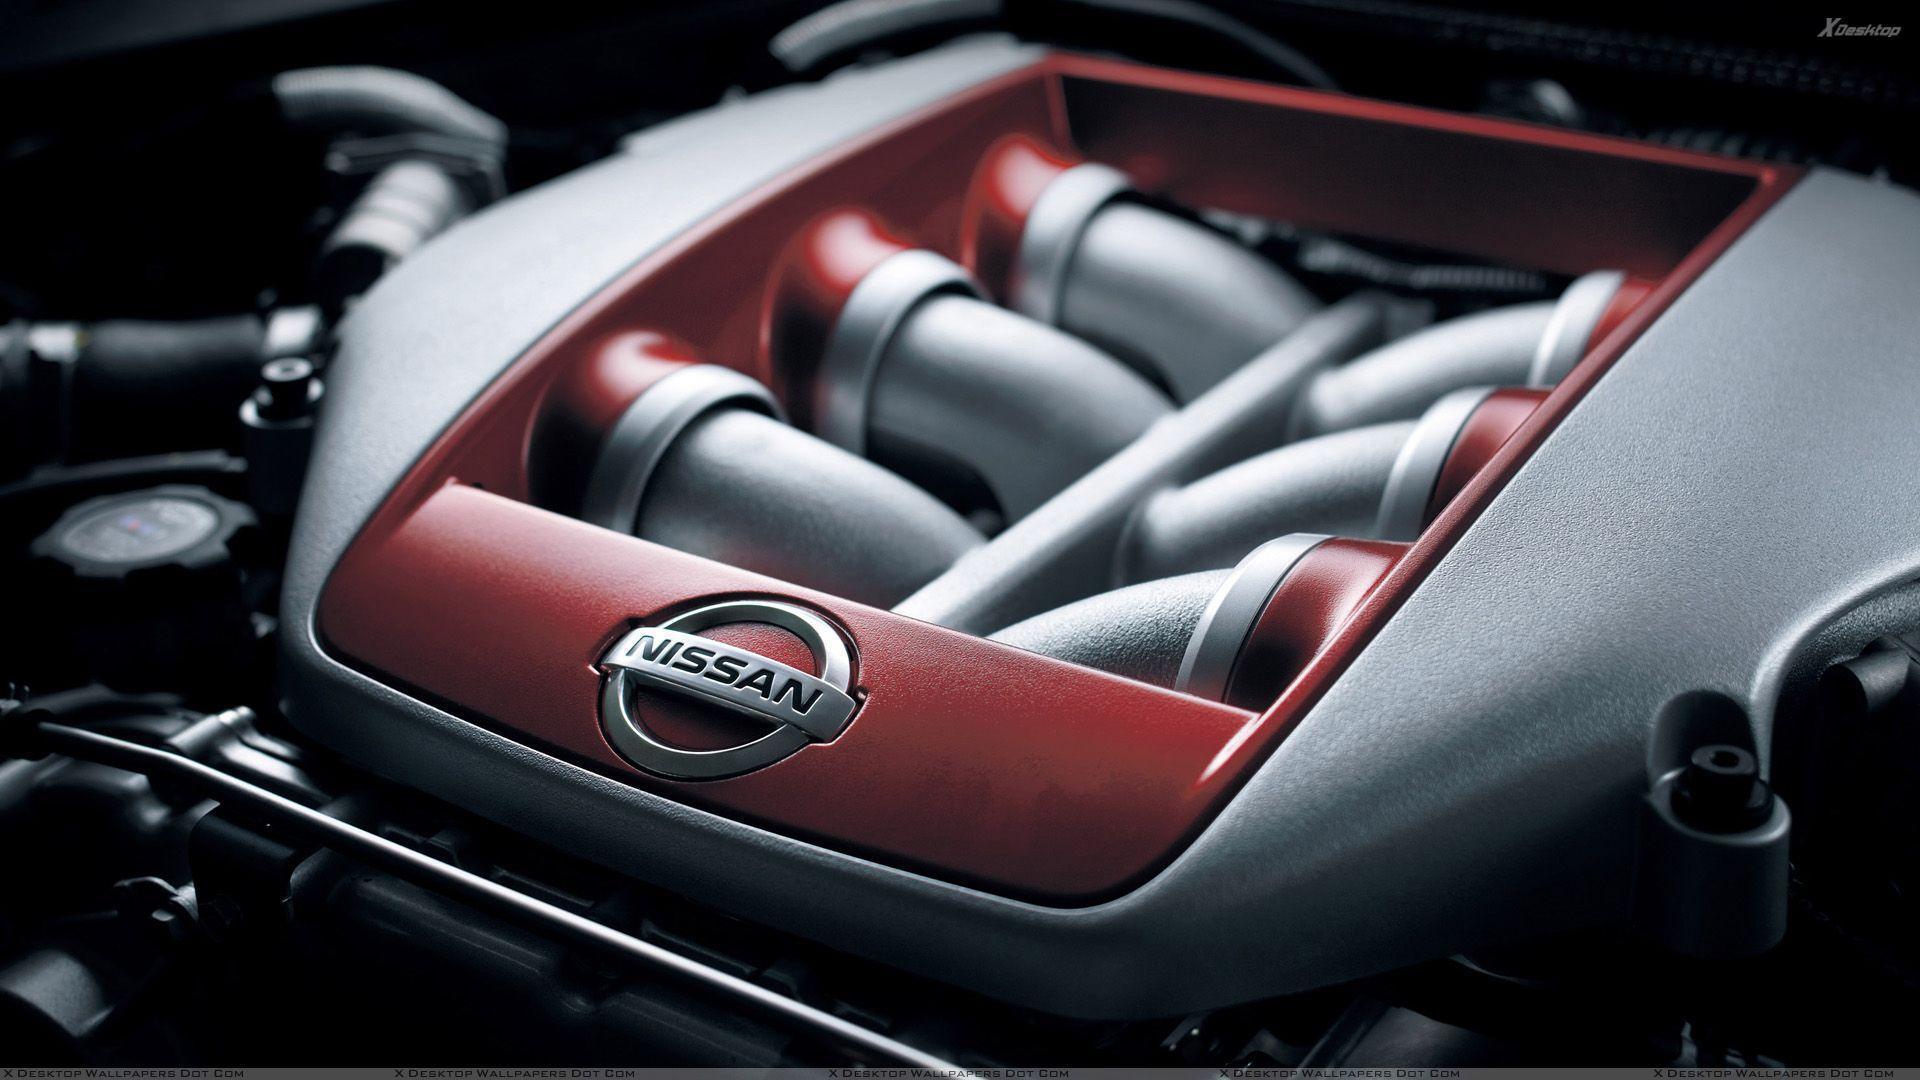 Nissan GTR Engine and Logo Wallpapers · 4K HD Desktop Backgrounds ...